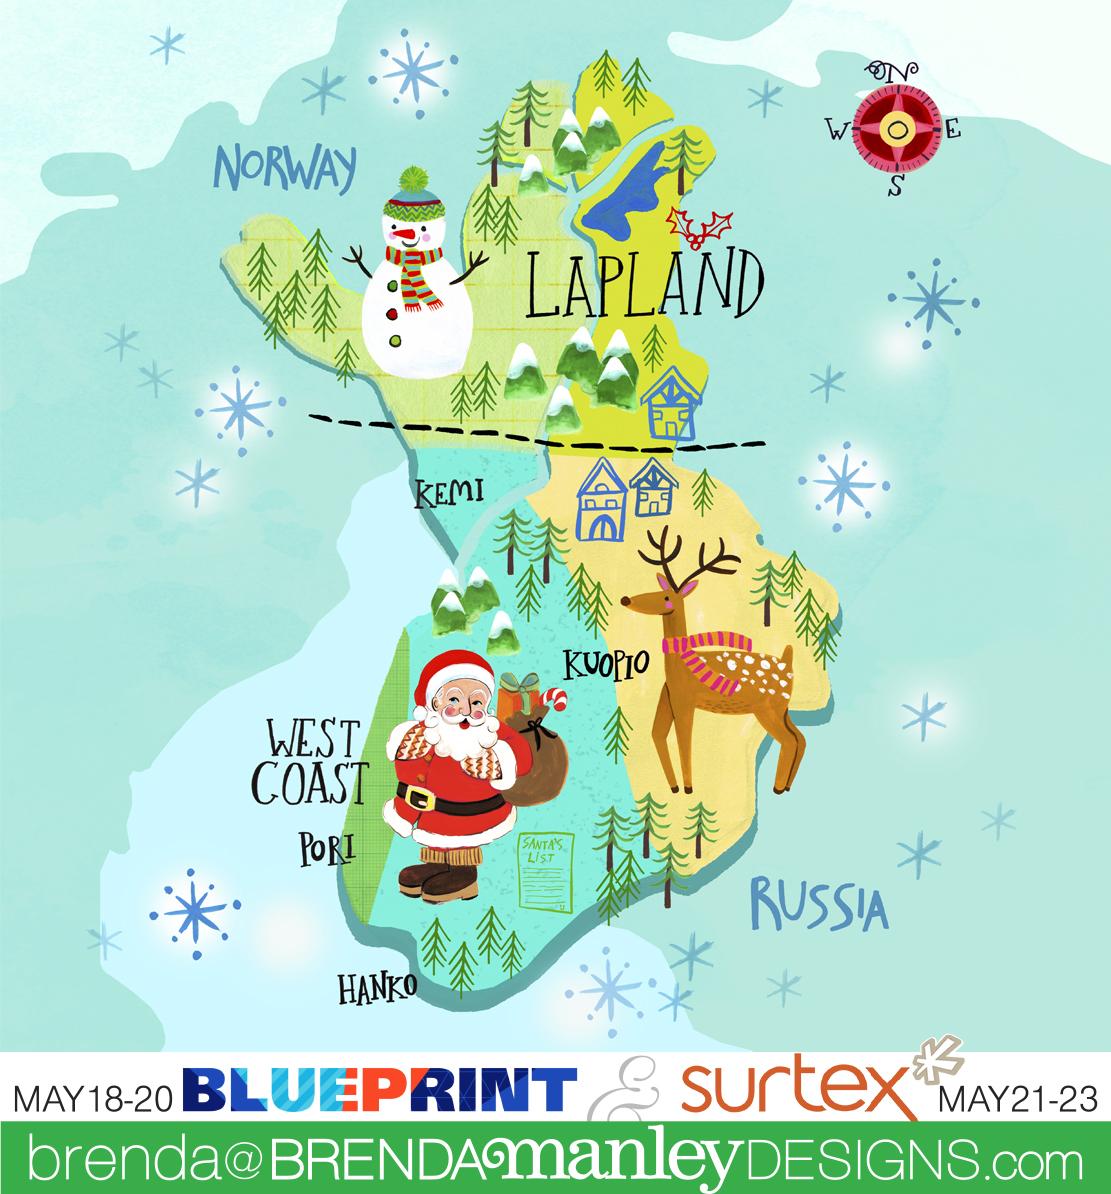 Blueprint-&-Surtex-flyer-emmajayne-designs.jpg